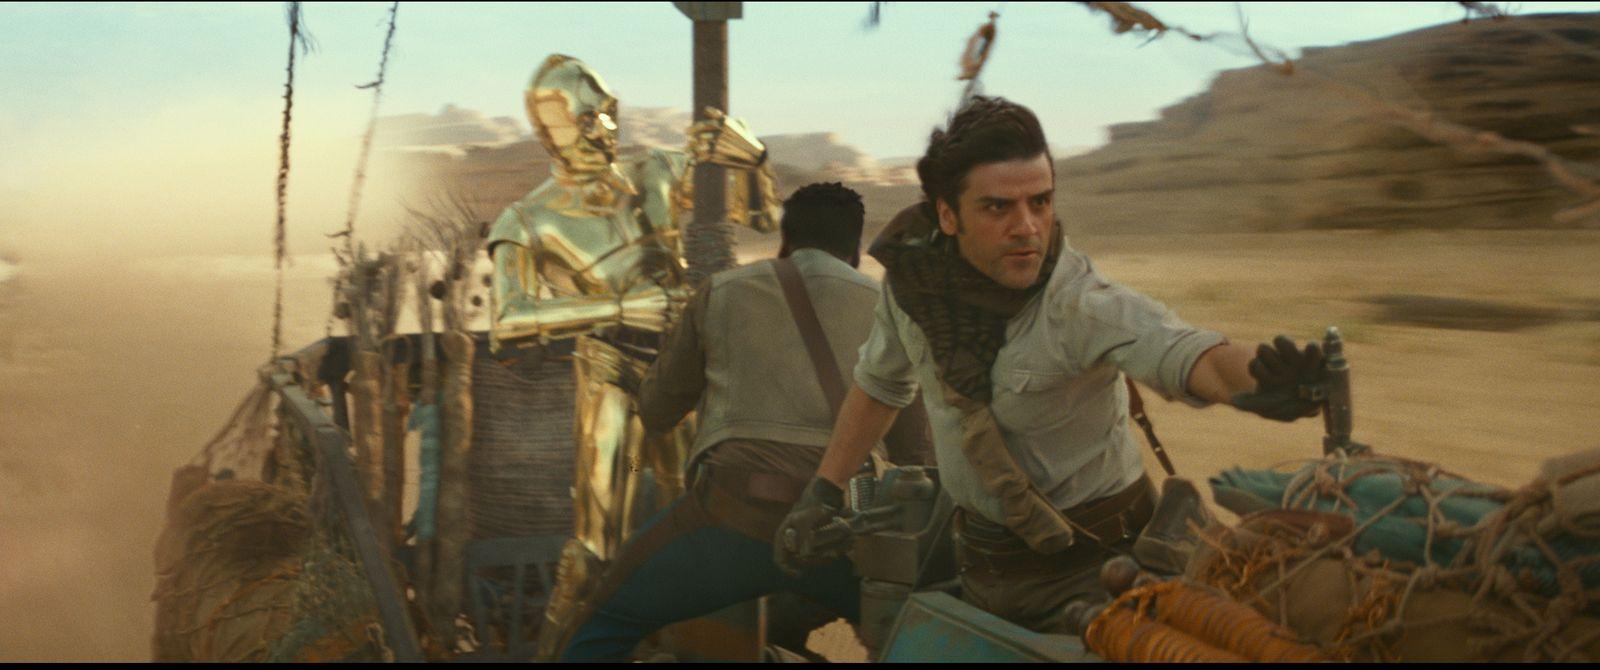 Fotogaléria Star Wars: Vzostup Skywalkera (2019)